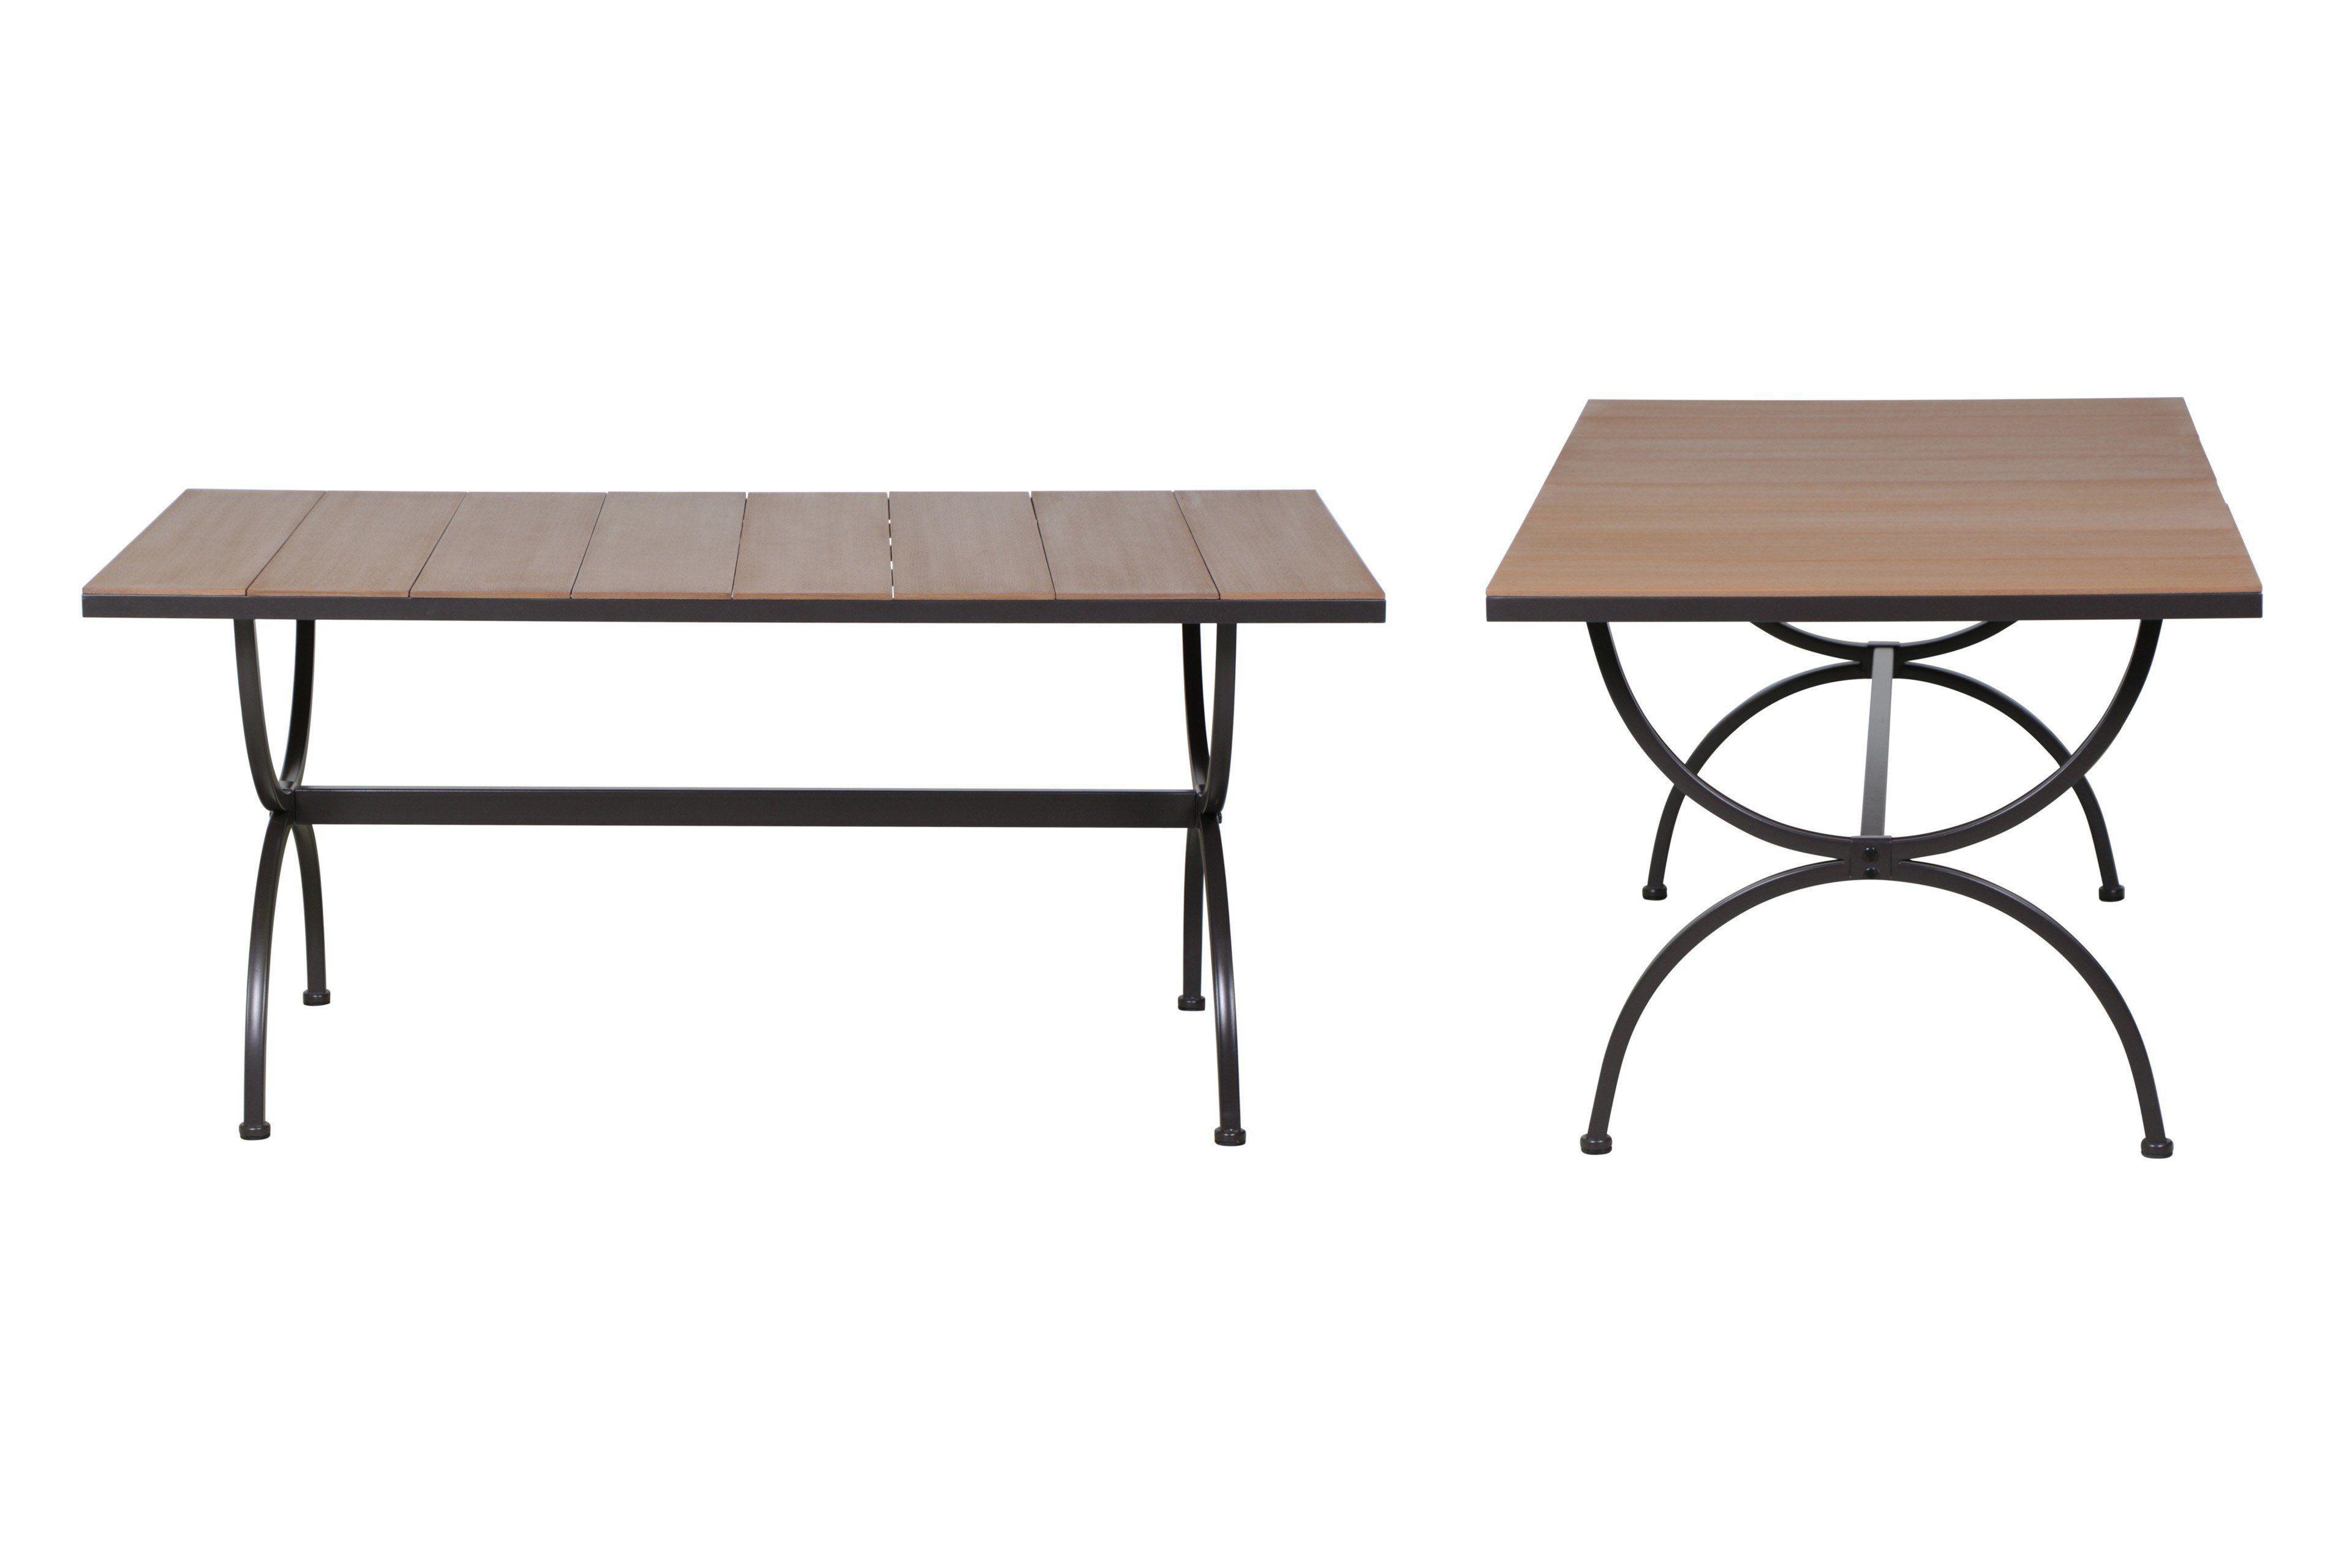 gro artig resysta gartenm bel ideen die schlafzimmerideen. Black Bedroom Furniture Sets. Home Design Ideas